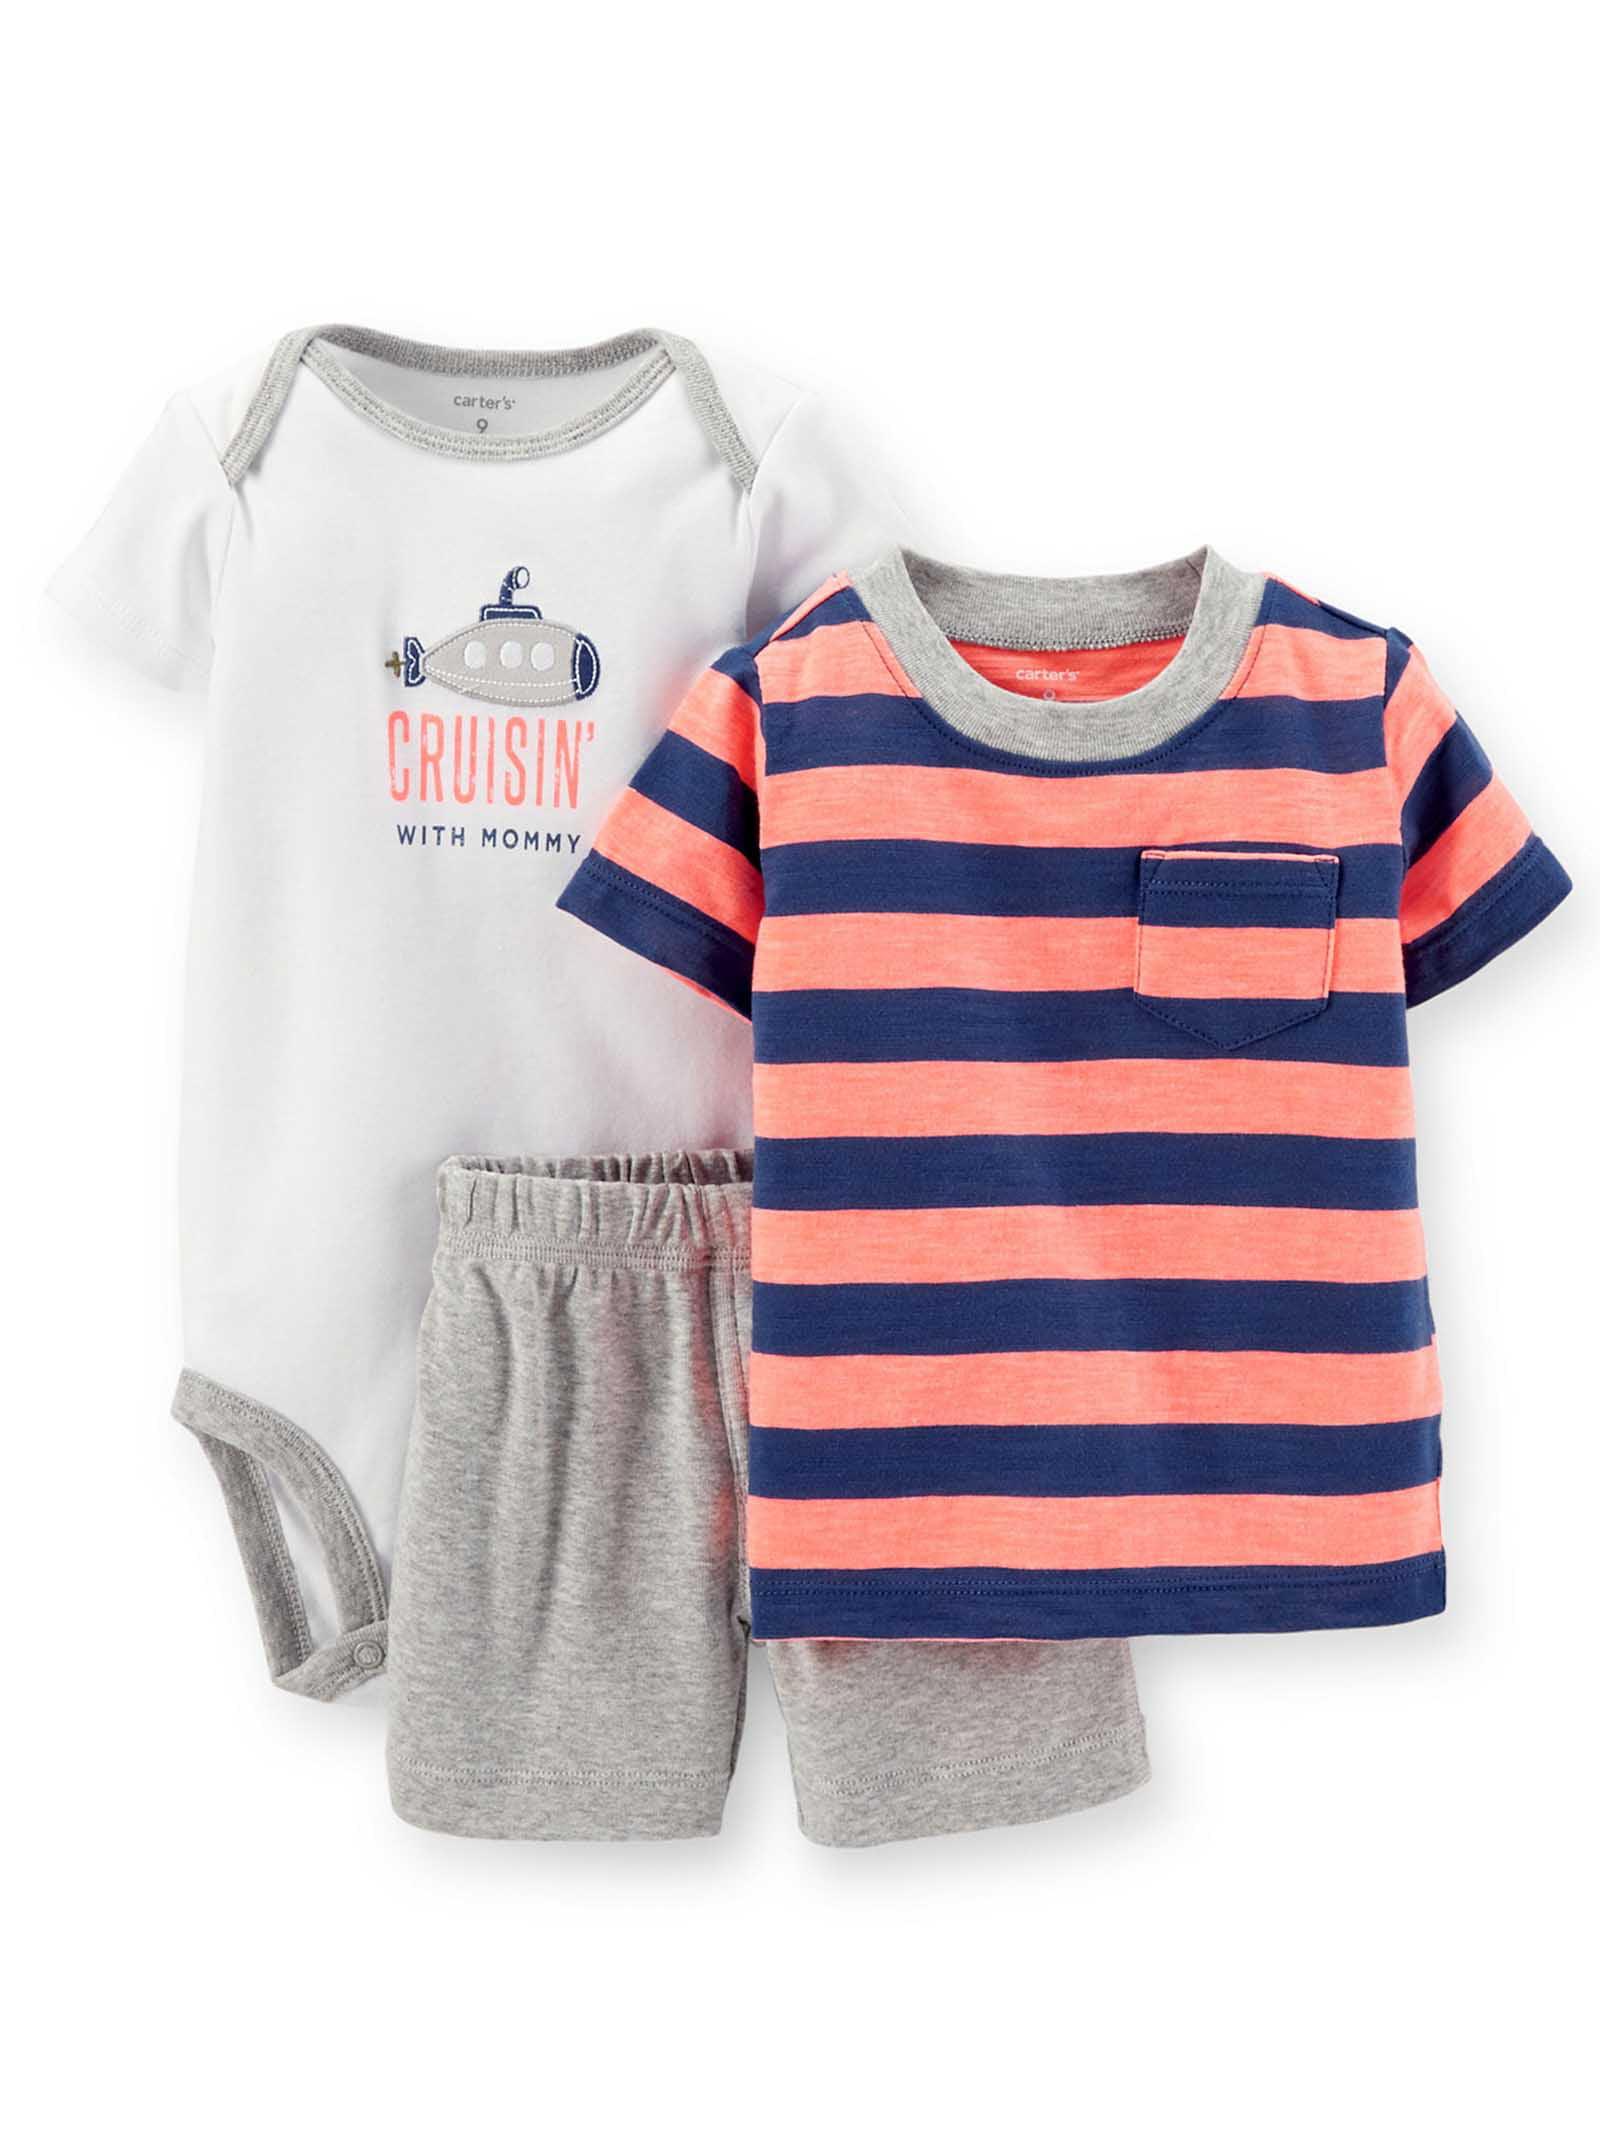 Carters Baby Boys 3 Piece Cruisin' Tee, Bodysuit and Shorts Set